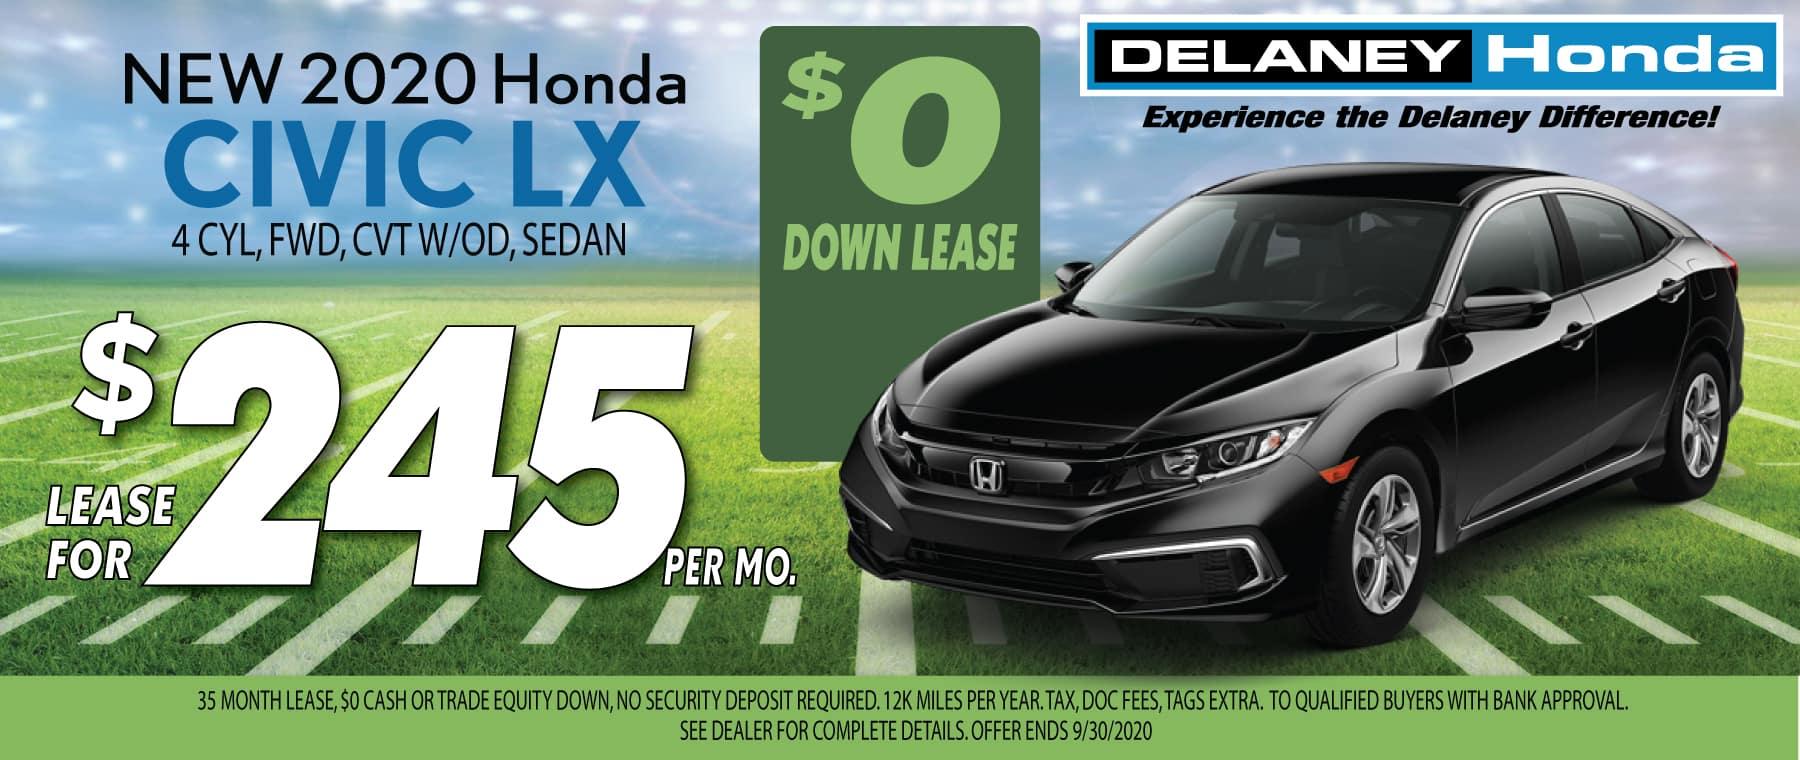 Honda Civic Lease Offer